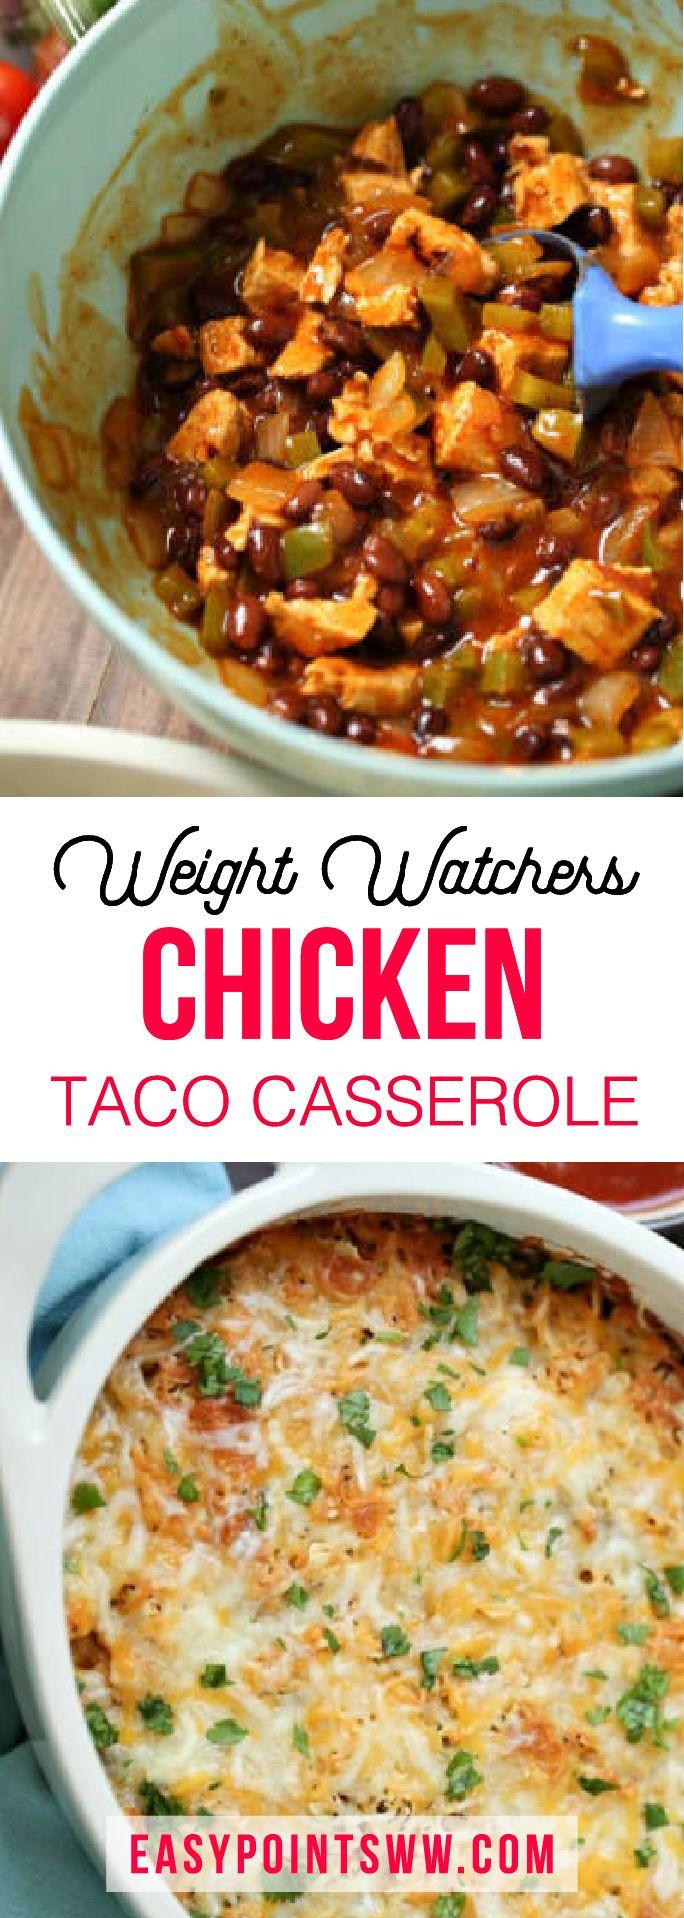 Healthy Chicken Casserole Recipes Weight Watchers  25 best ideas about Chicken taco casserole on Pinterest